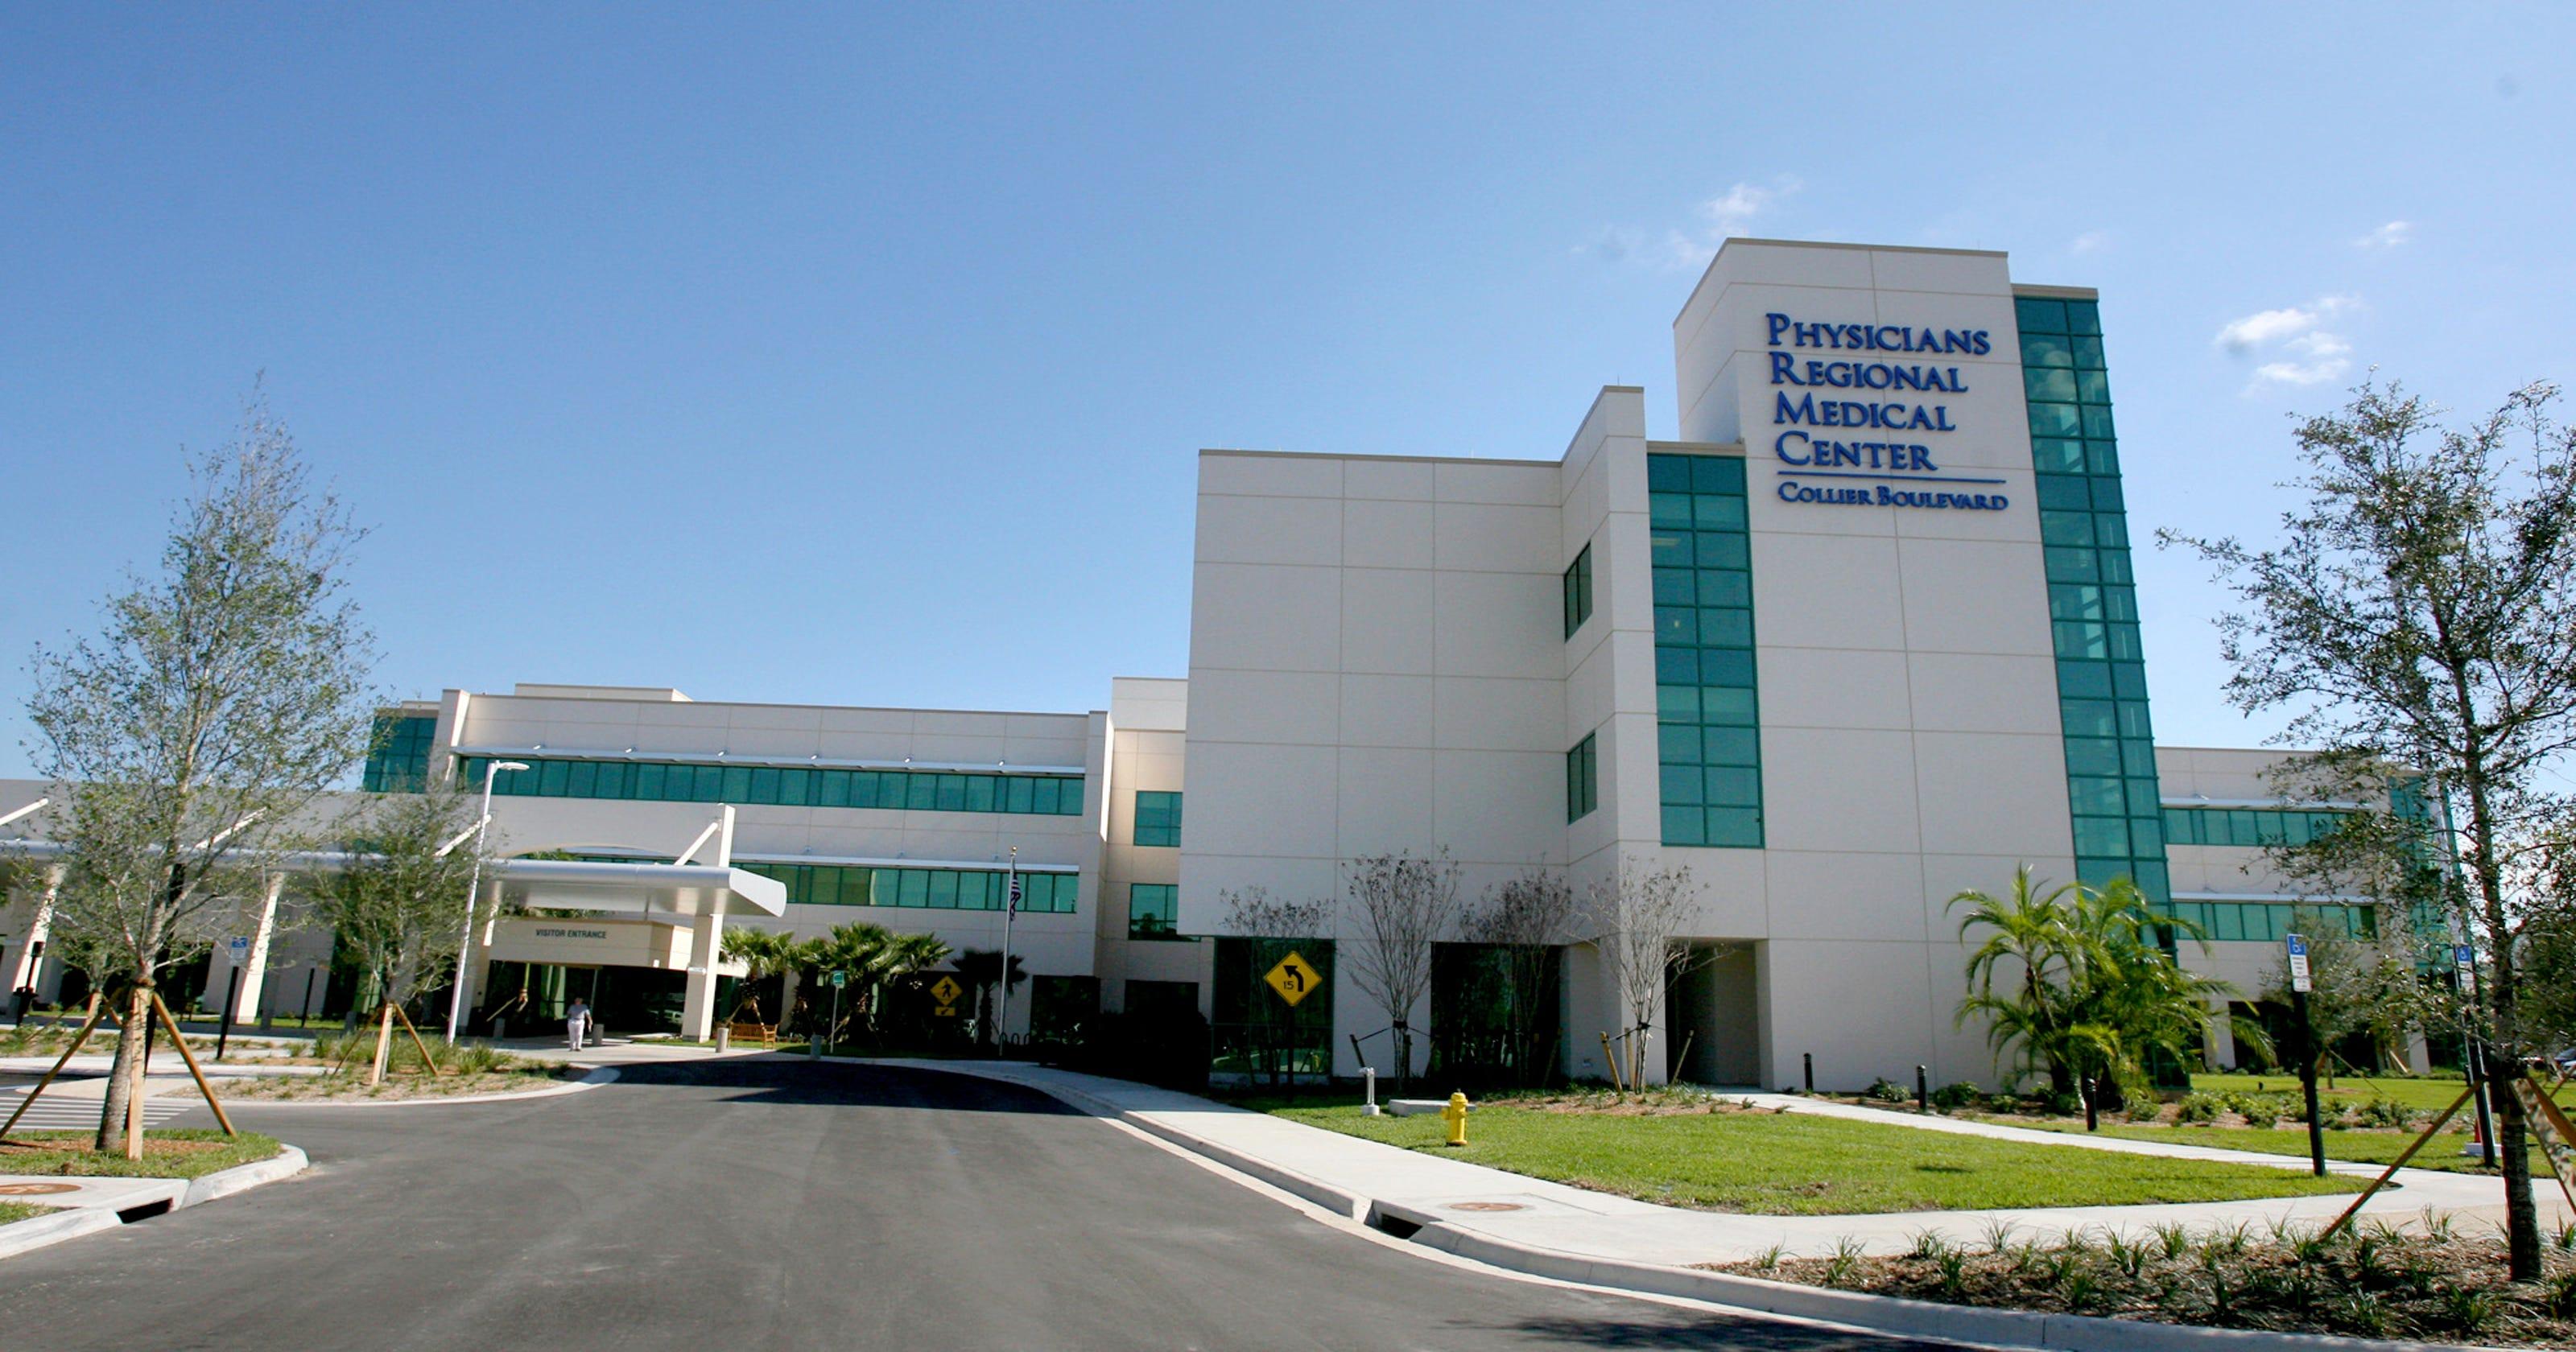 Physicians Regional Medical Center Emergency Room